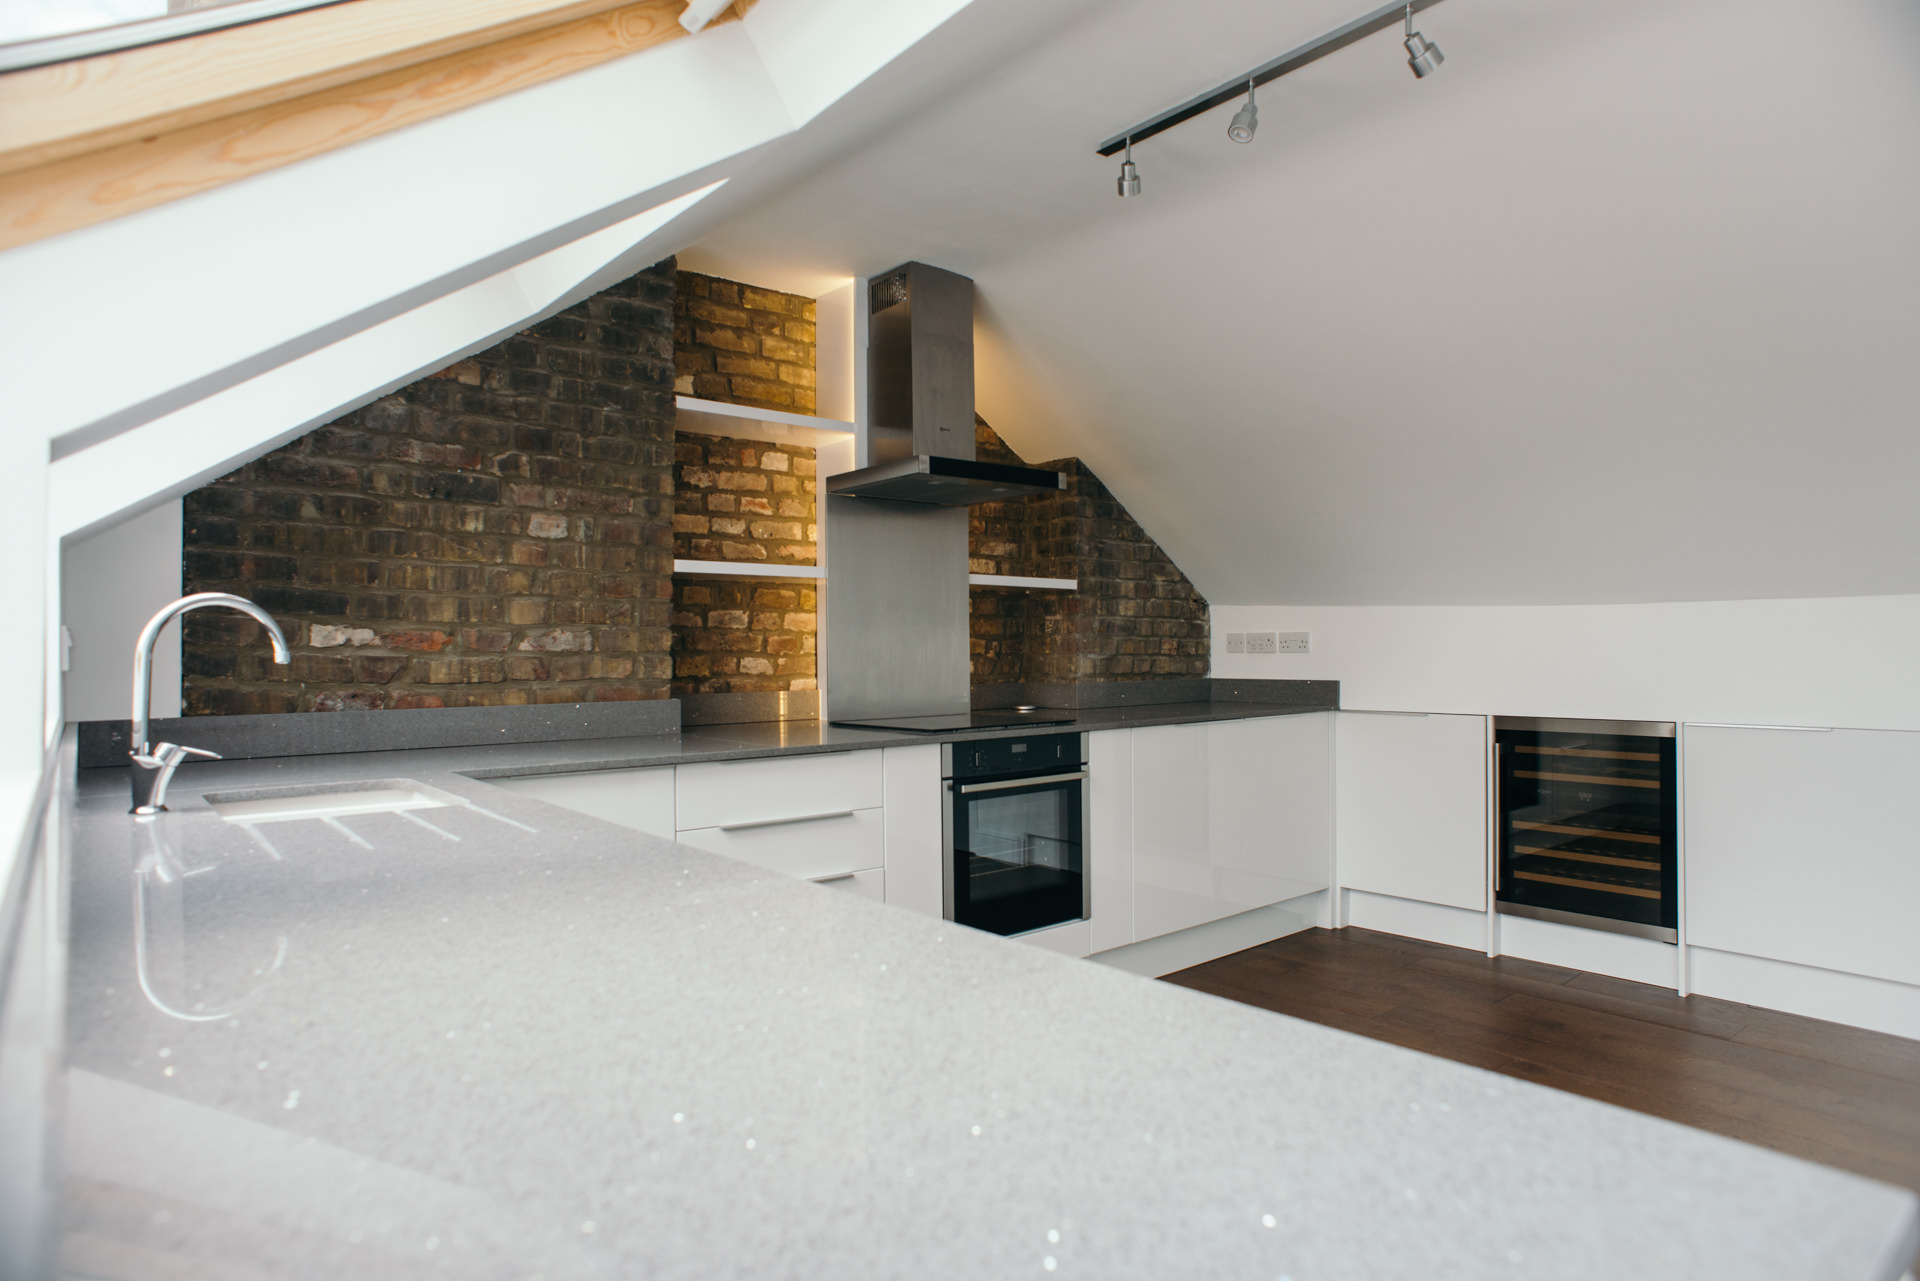 loft conversion work London